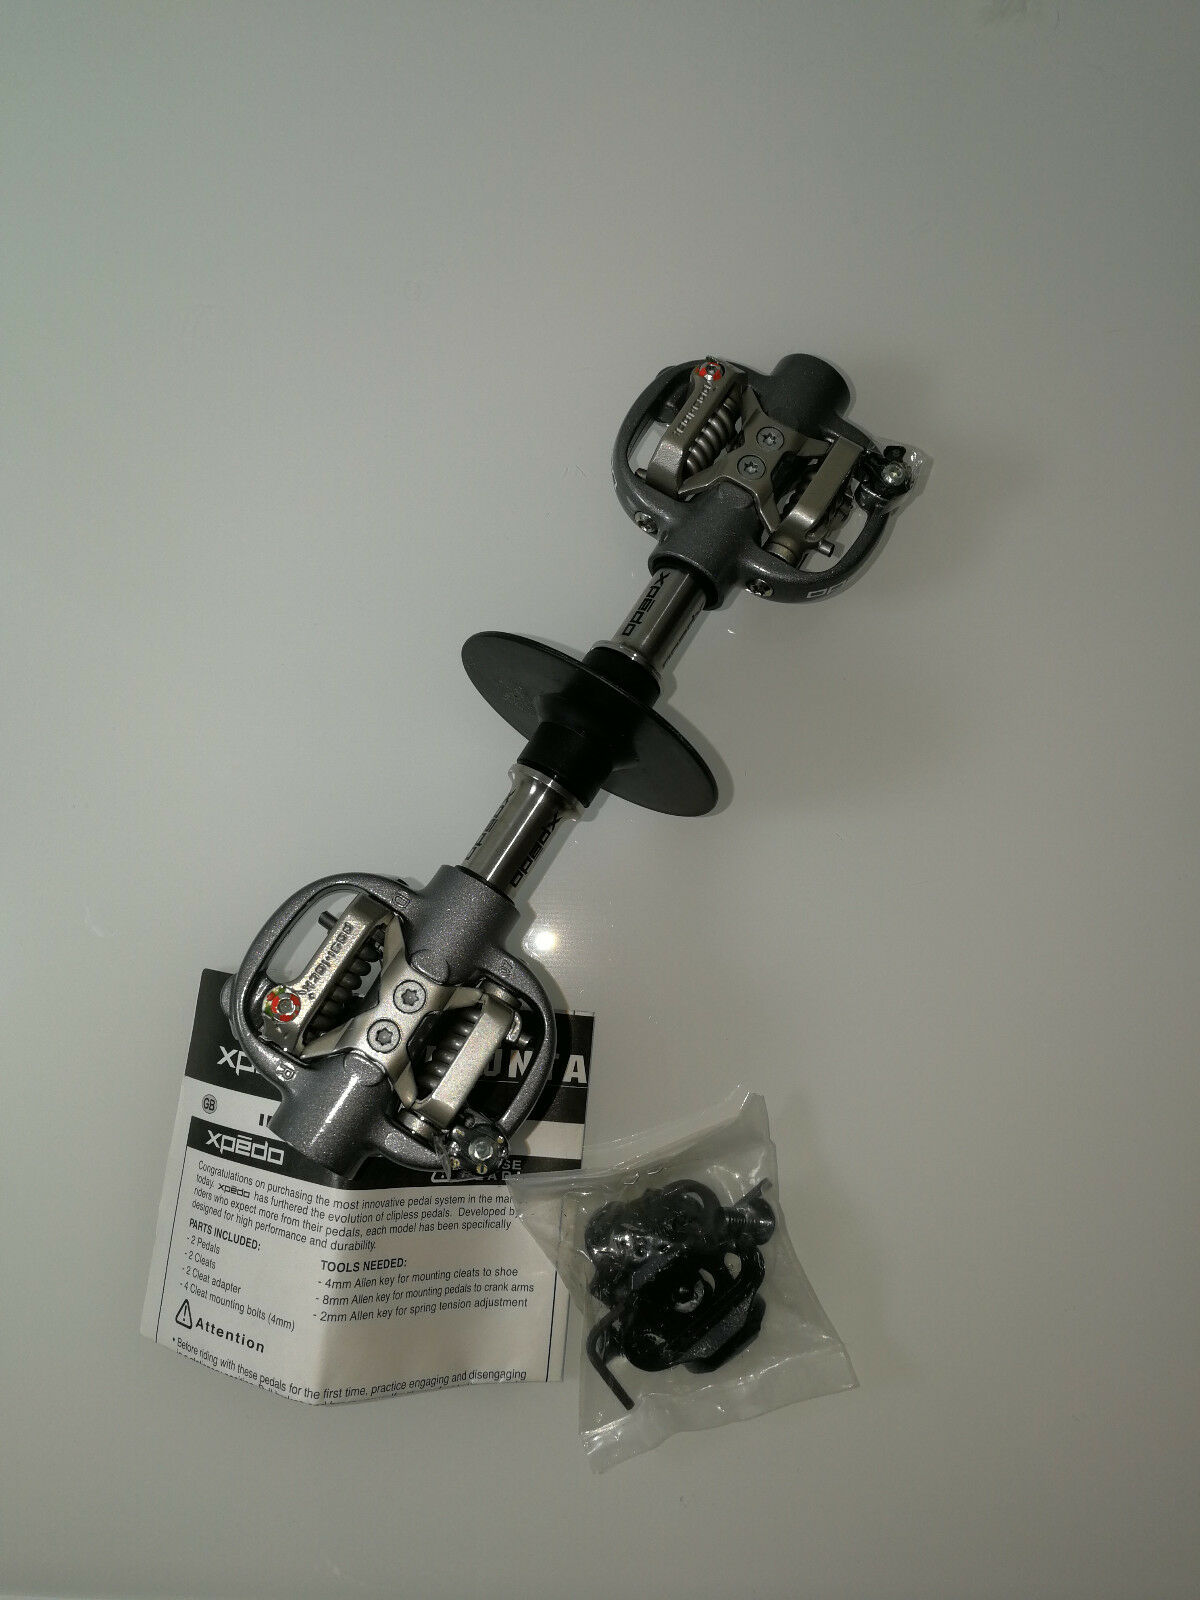 Xpedo Race pedal  m force mf-5 Renn pedales Xpedo Listón Design so1 sistema nuevo  compras de moda online